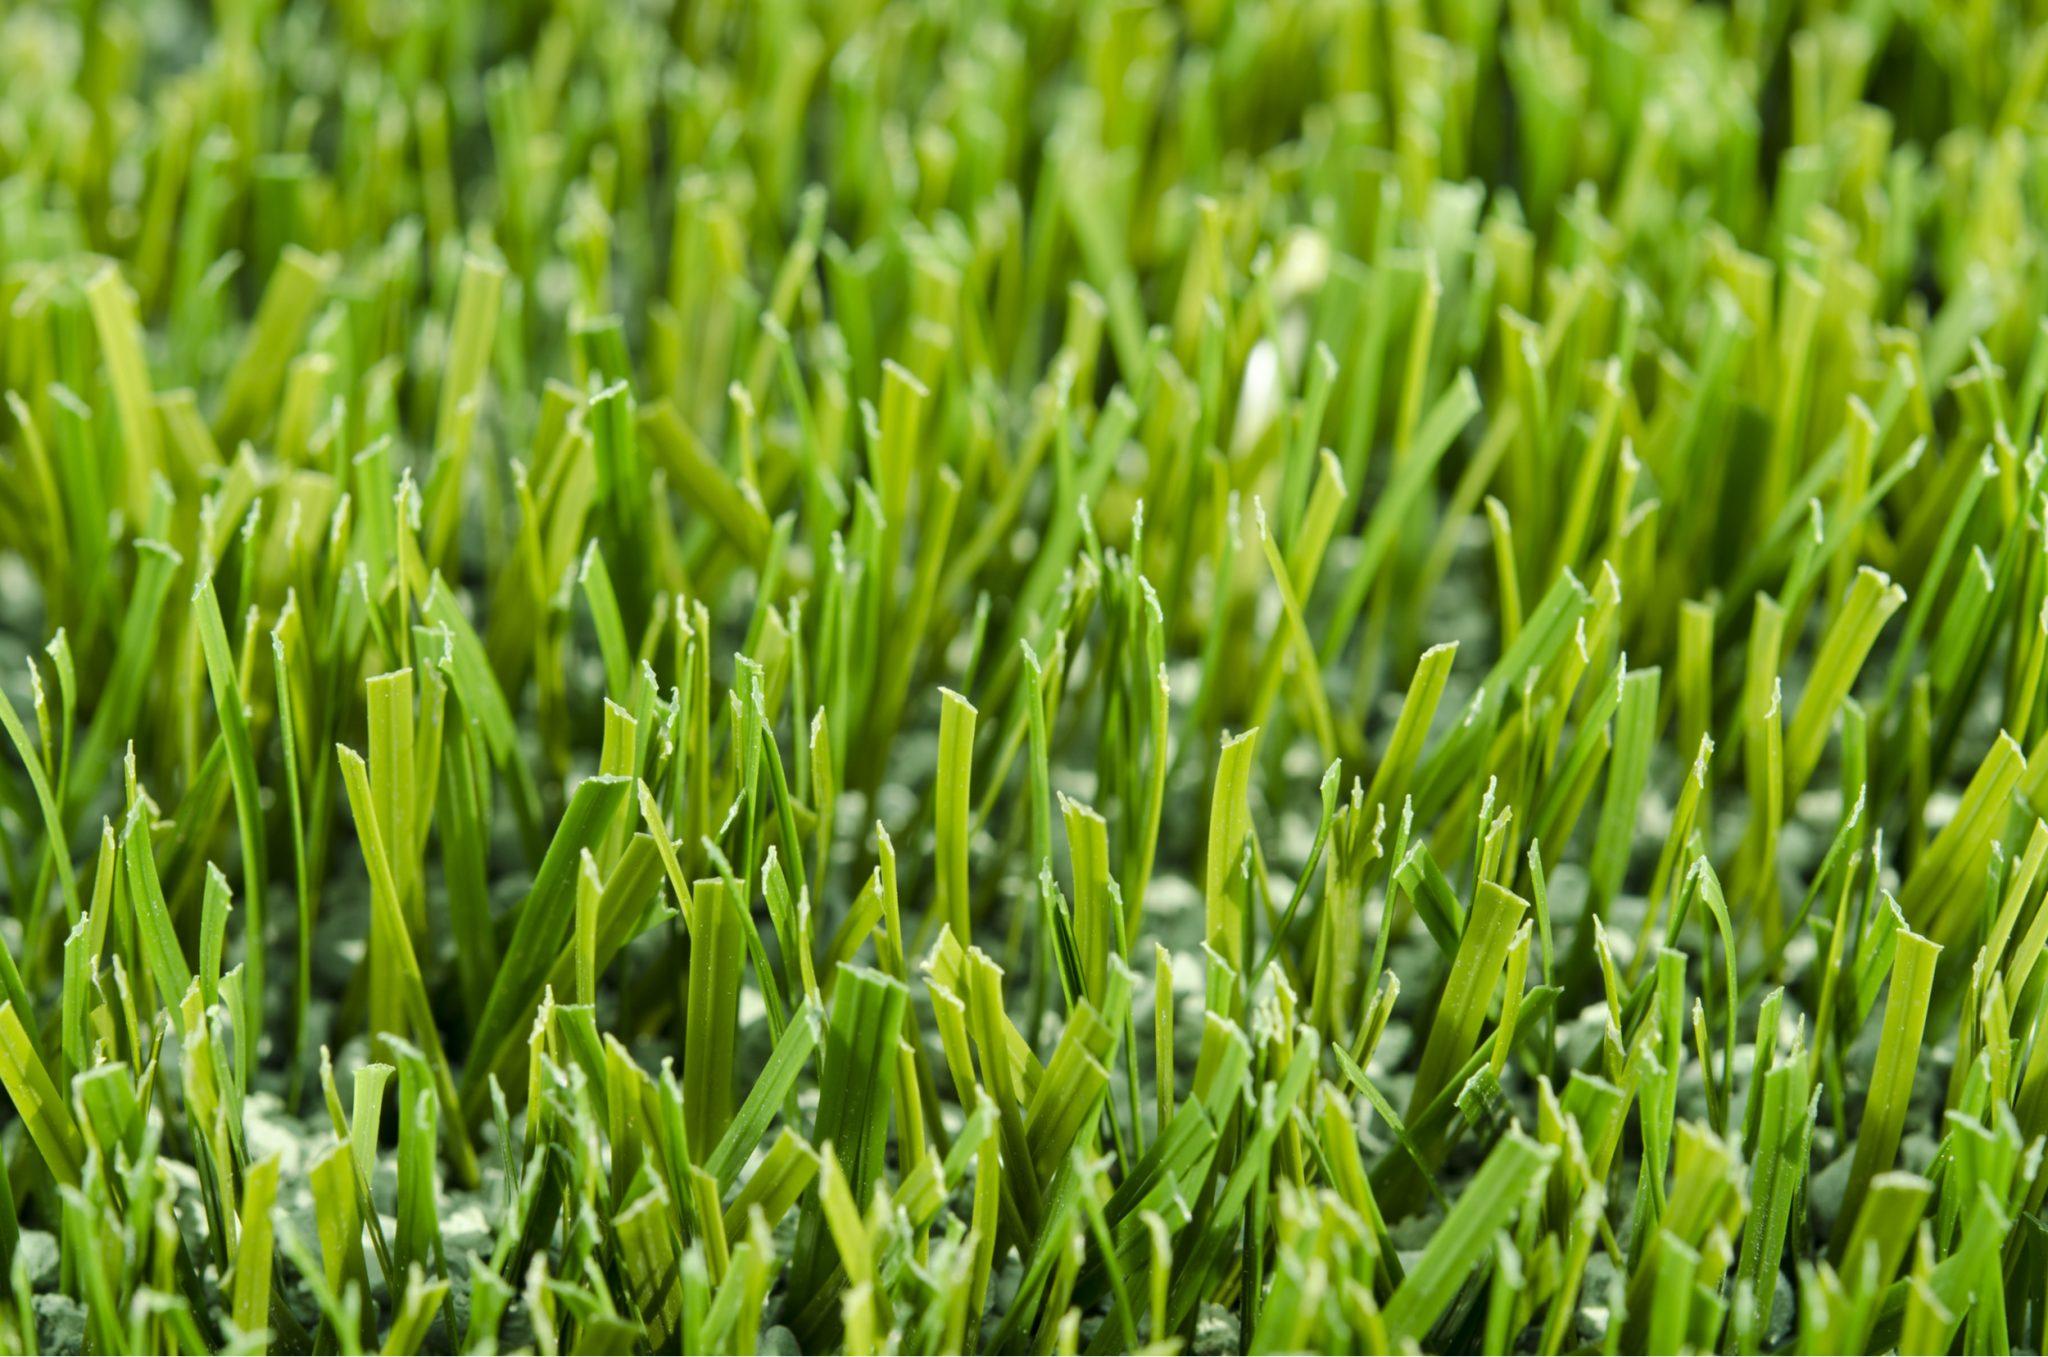 How to Rebloom Artificial Grass